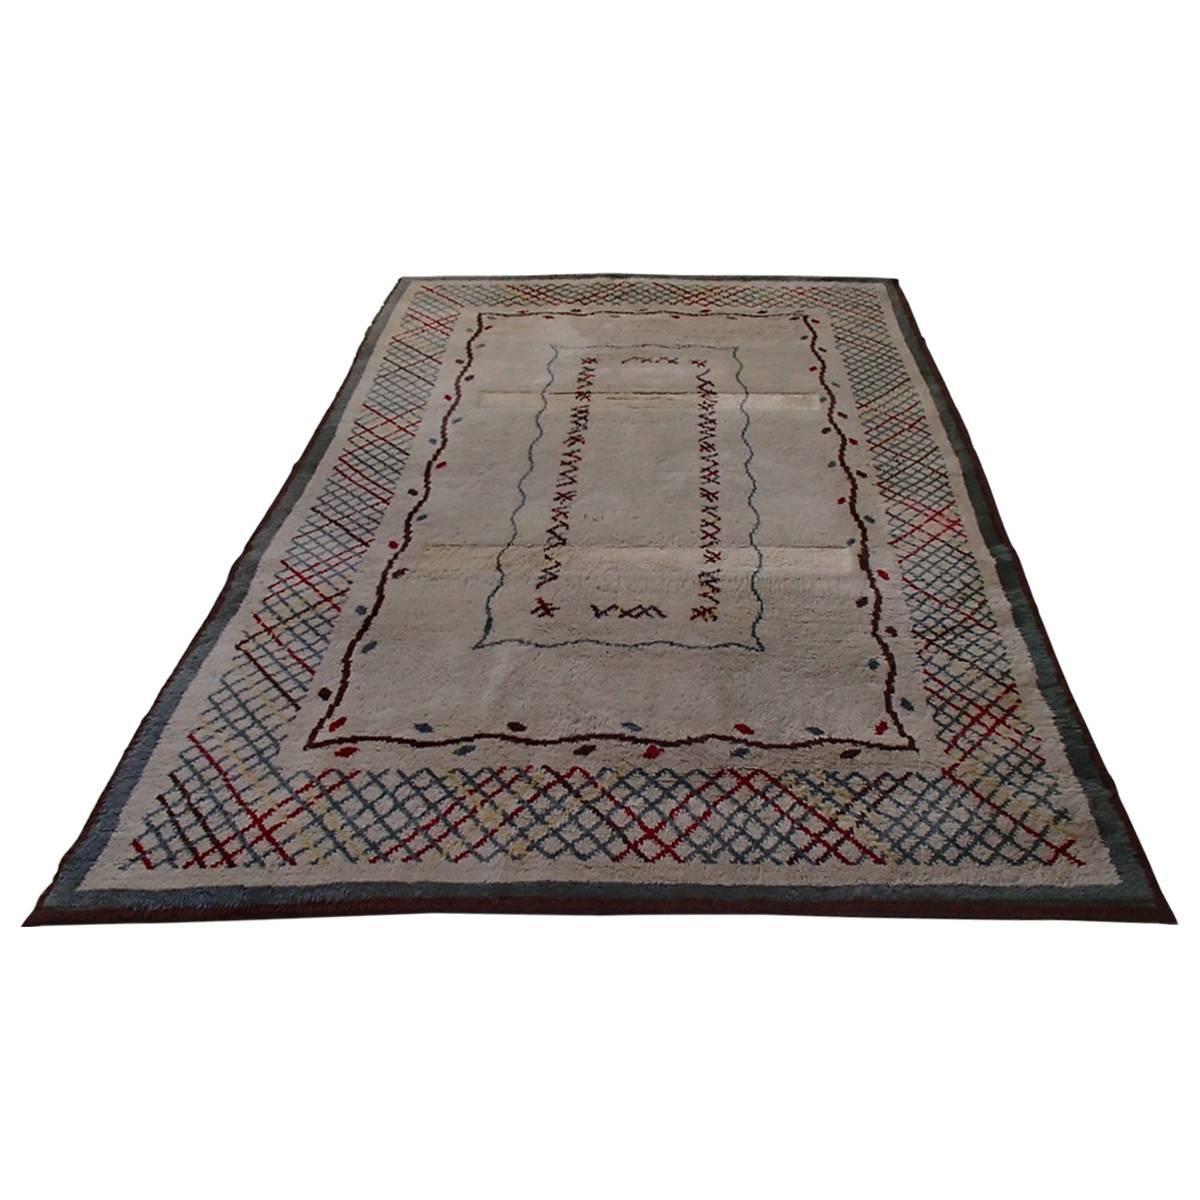 Midcentury carpet signed by Leleu